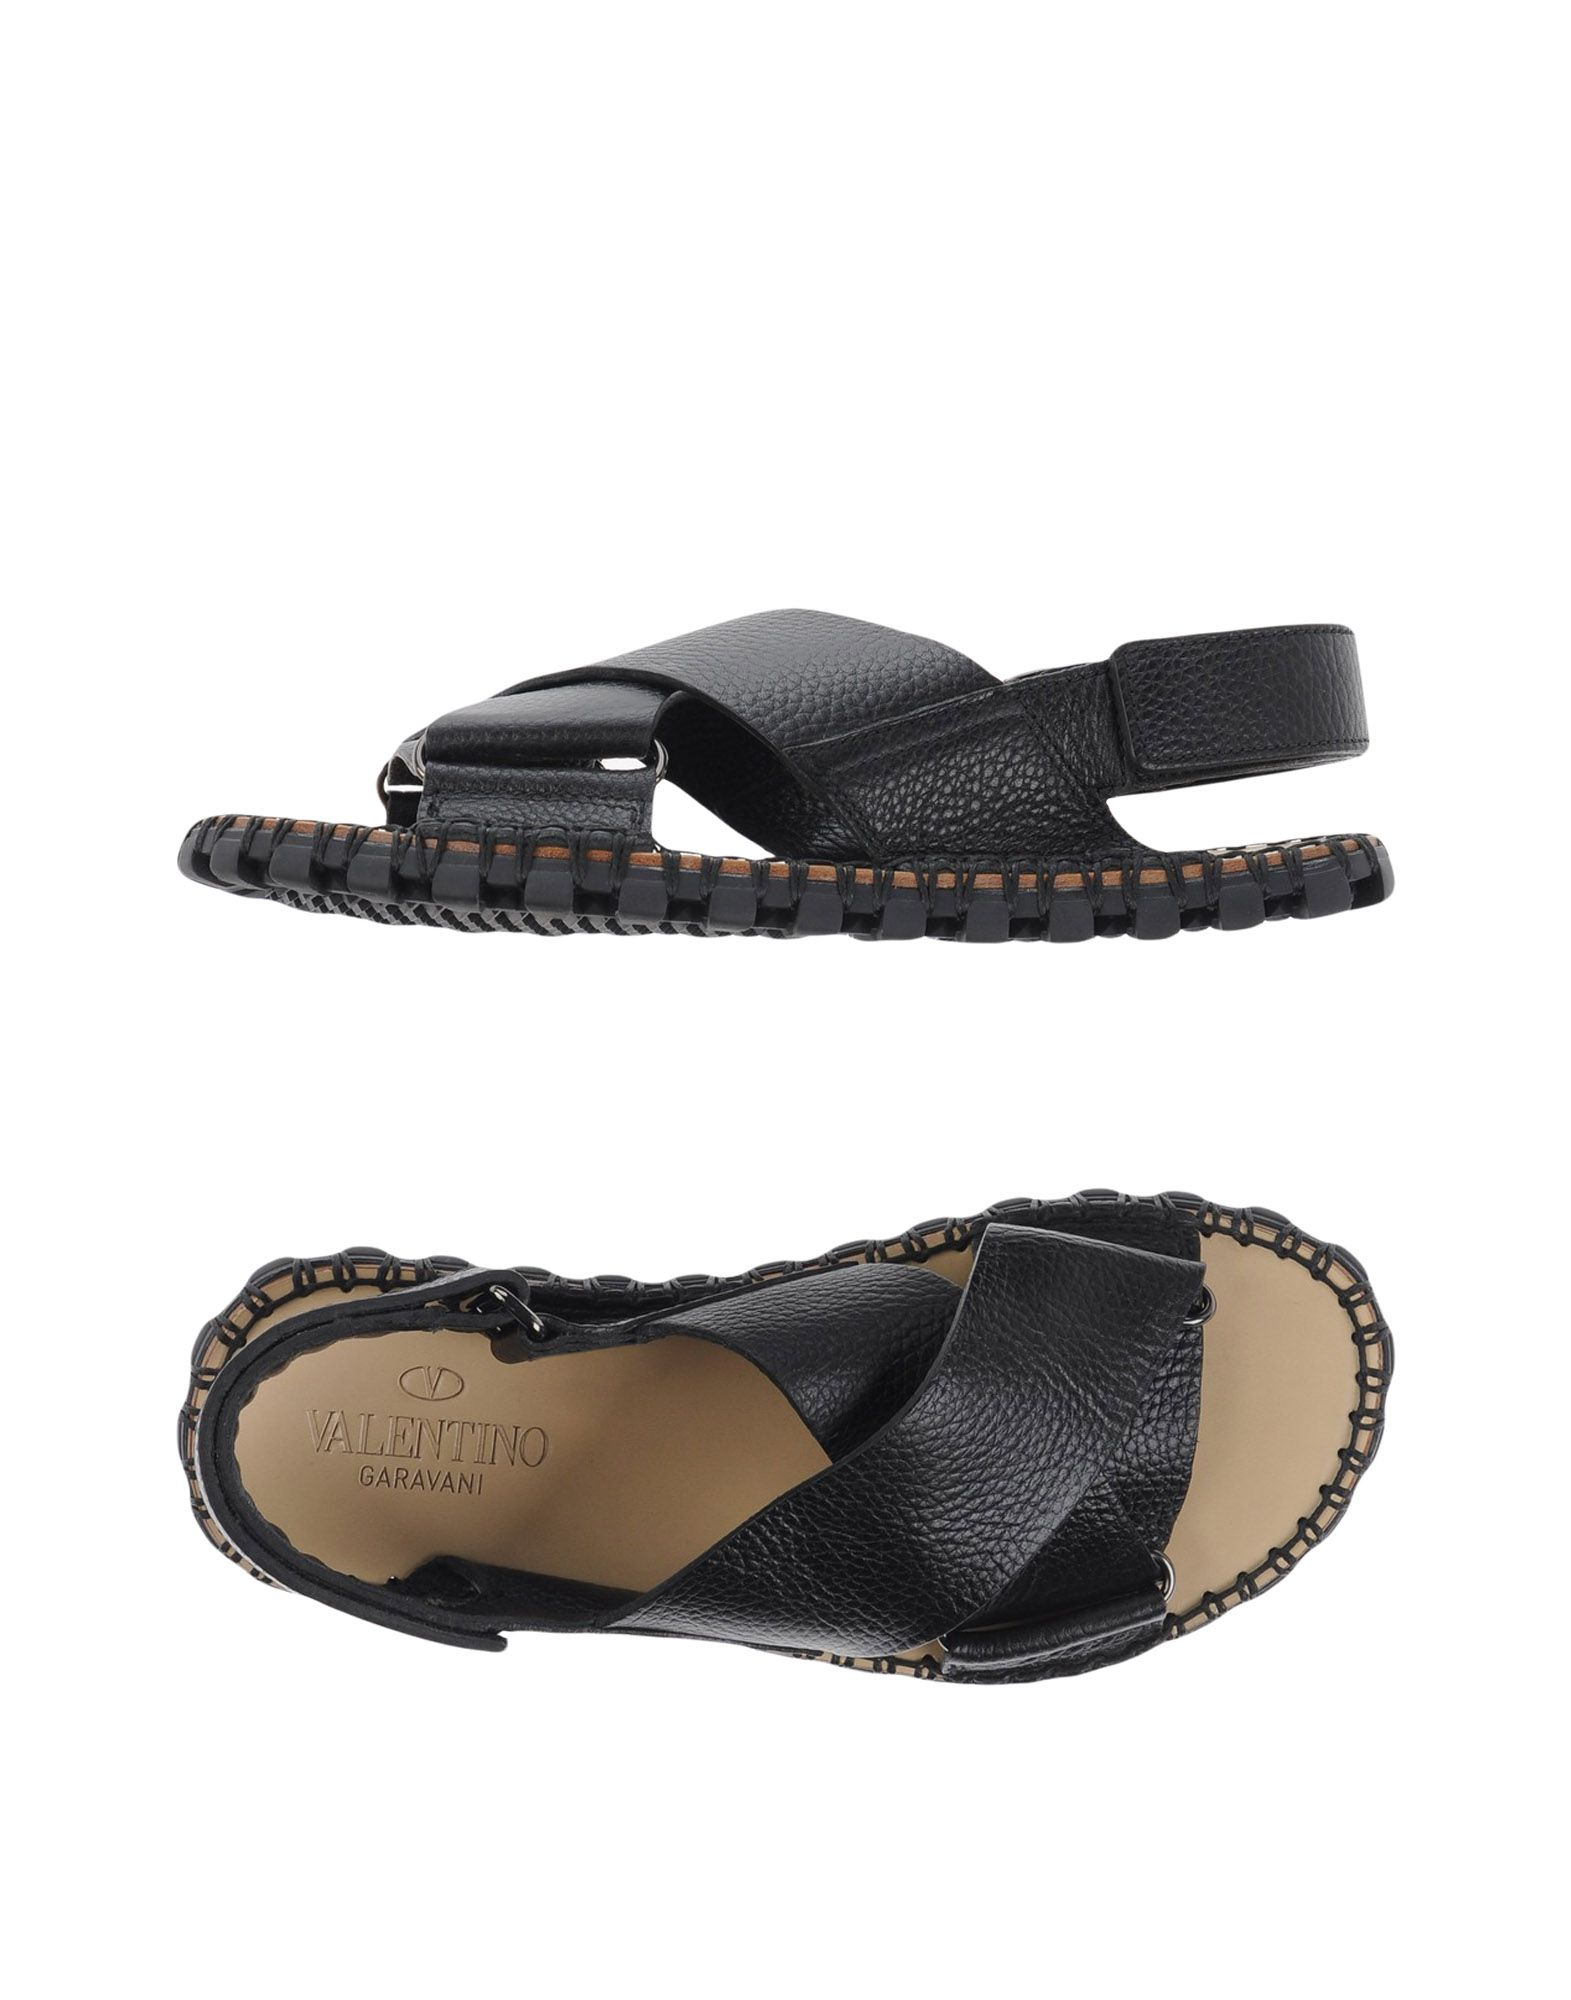 Valentino 11151919TP Garavani Sandalen Herren  11151919TP Valentino Gute Qualität beliebte Schuhe 6d5b0e